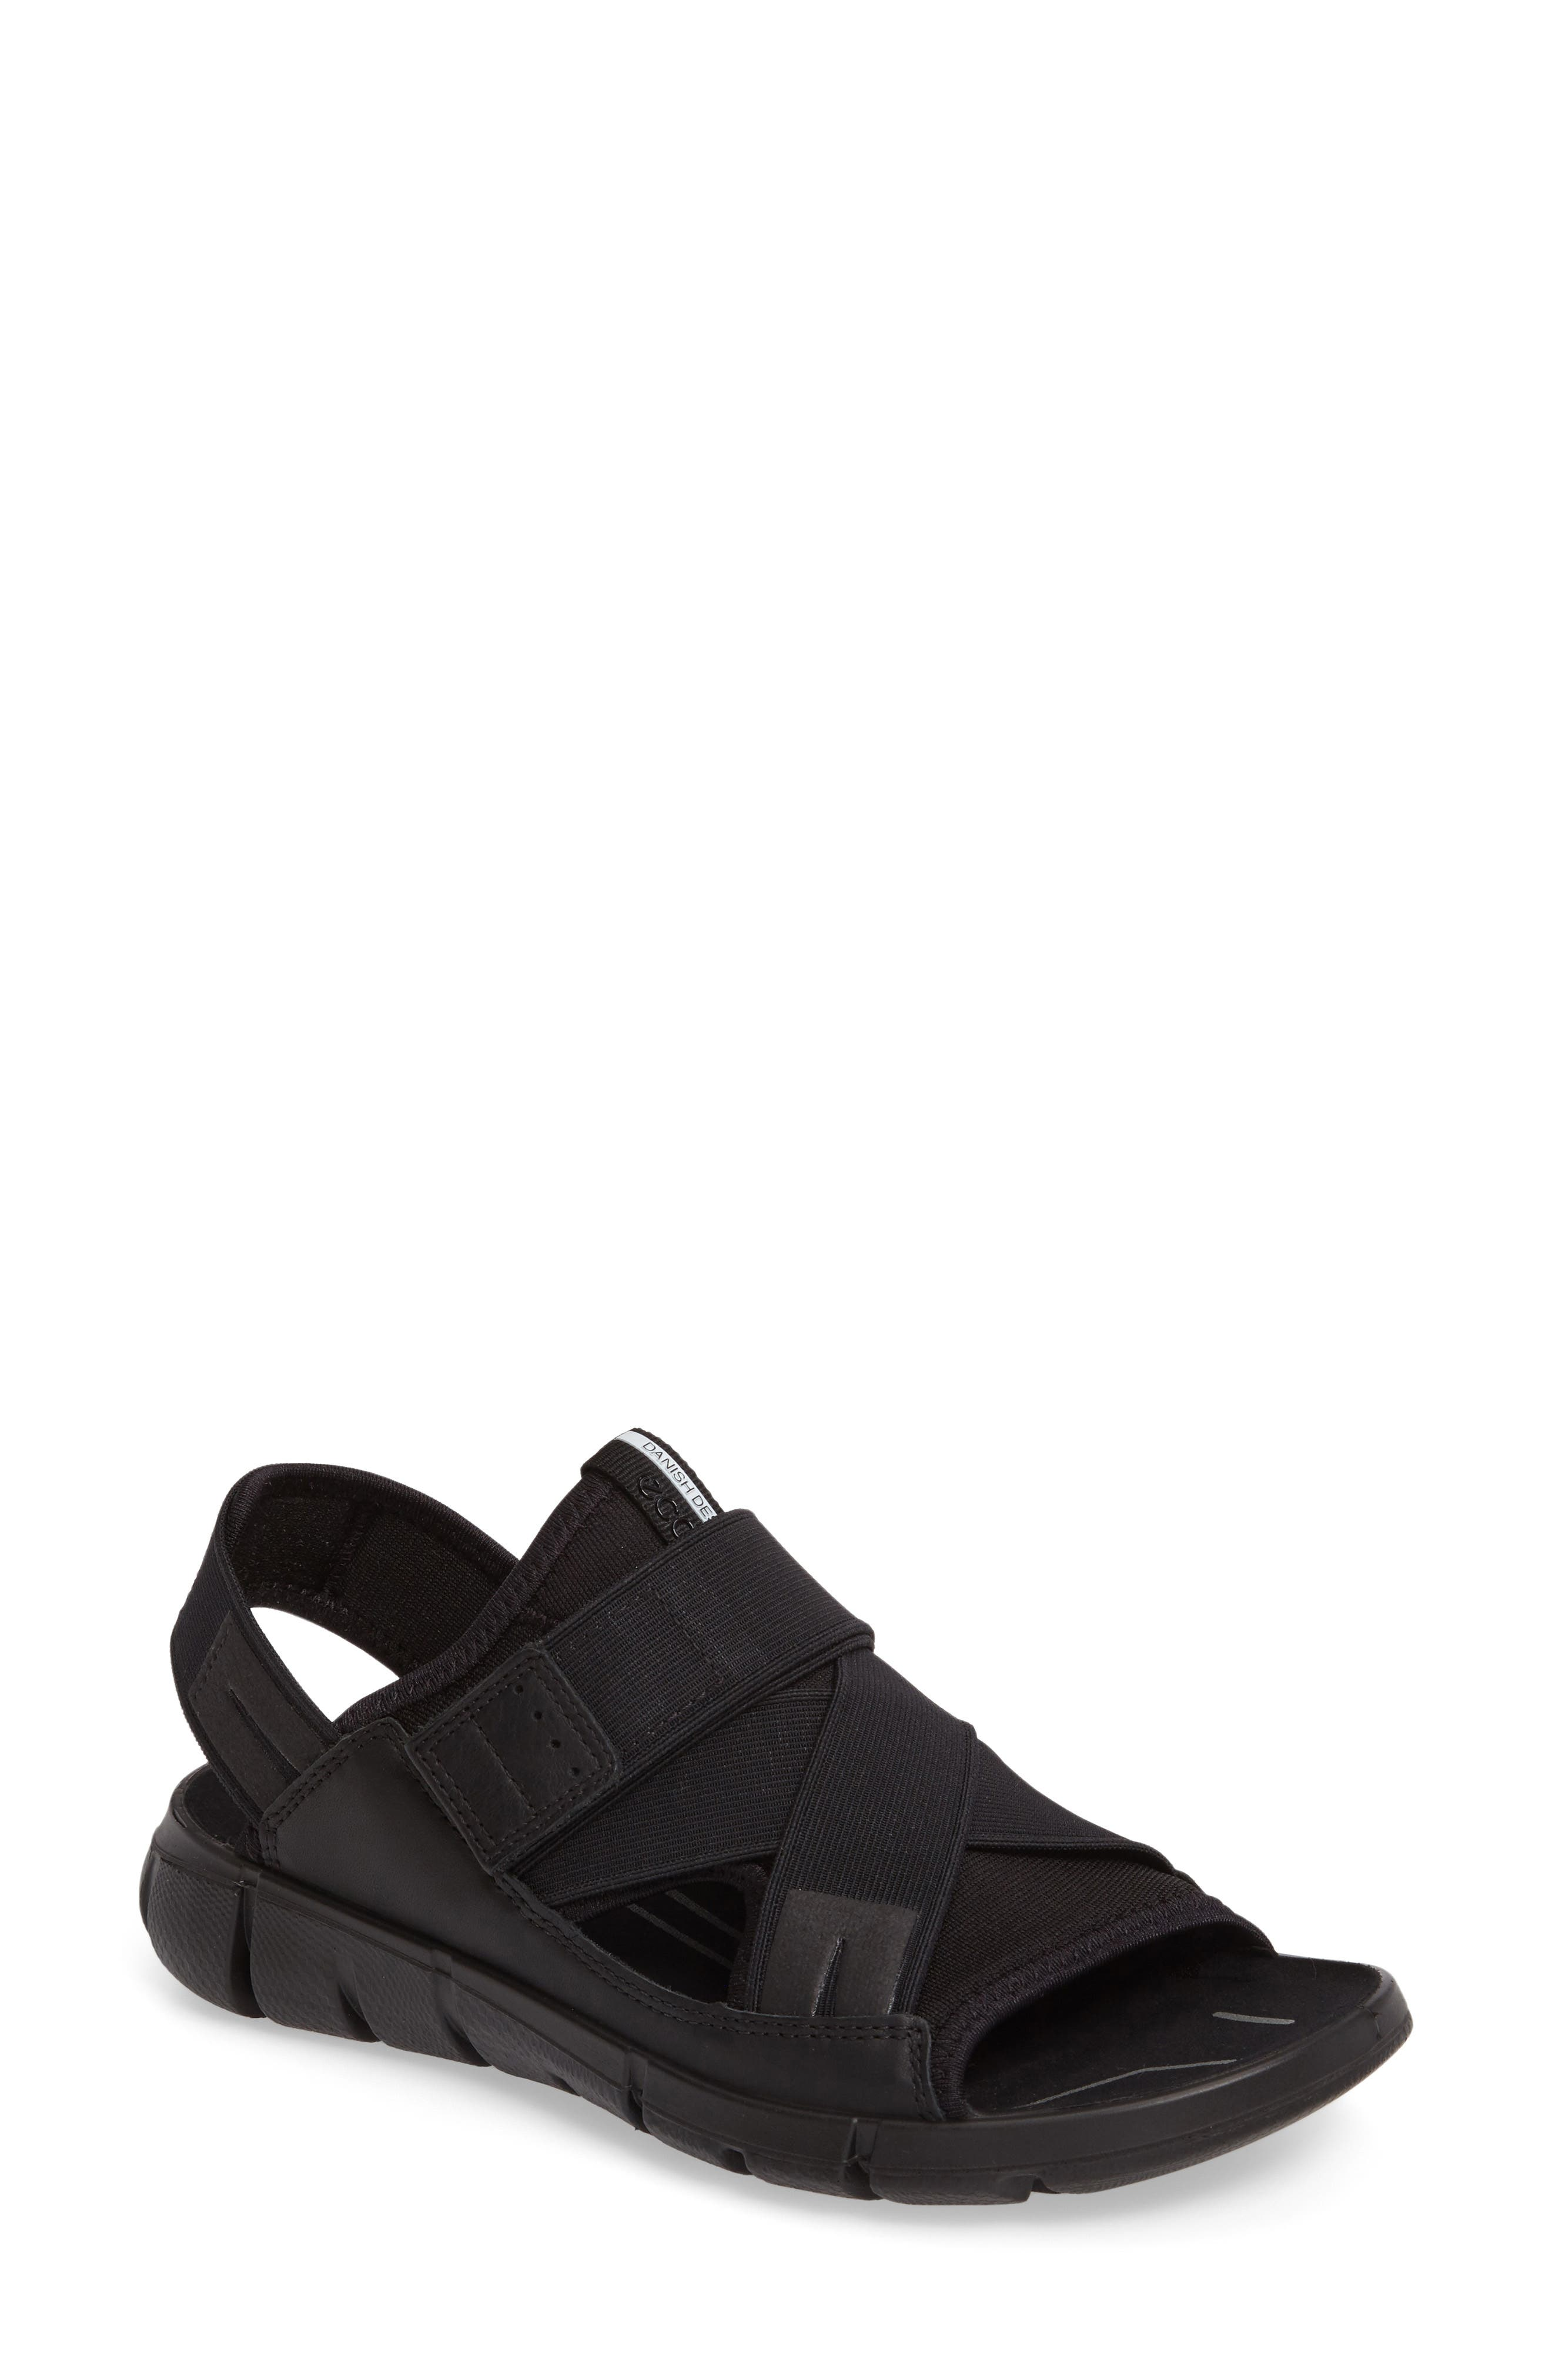 ECCO Intrinsic Sandal (Women)